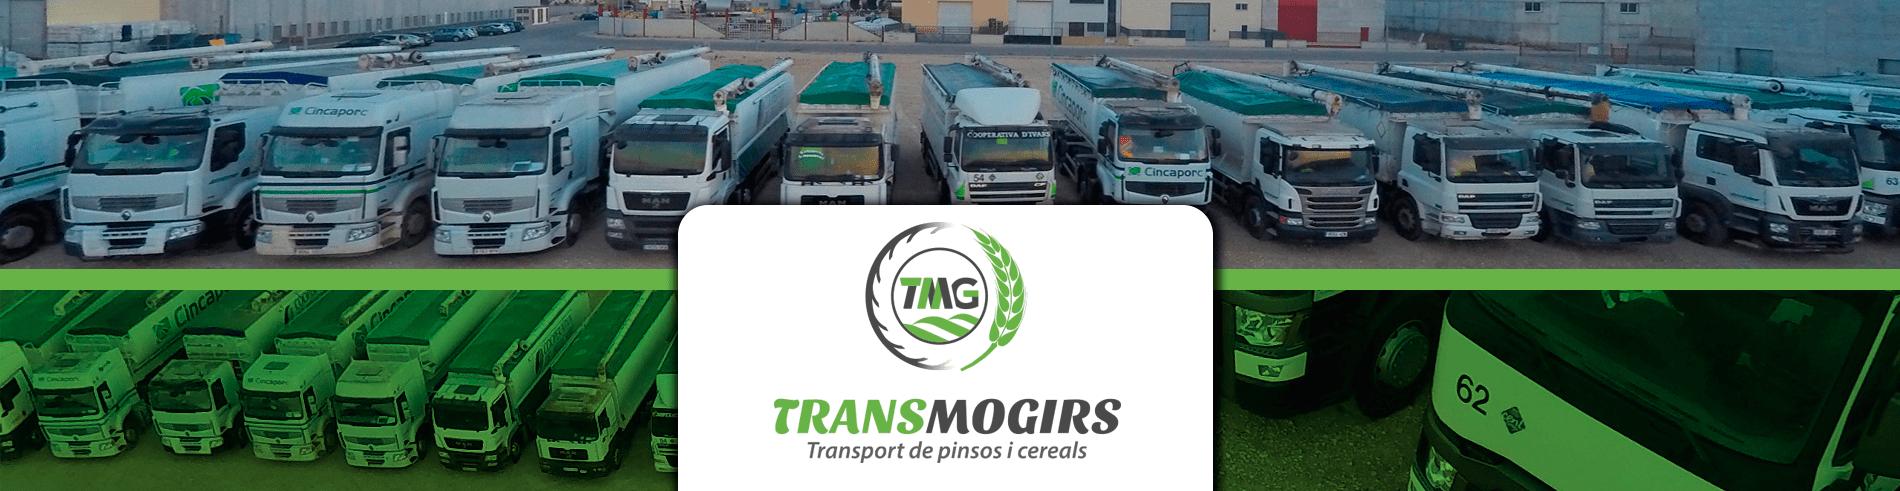 Transmogirs_banner